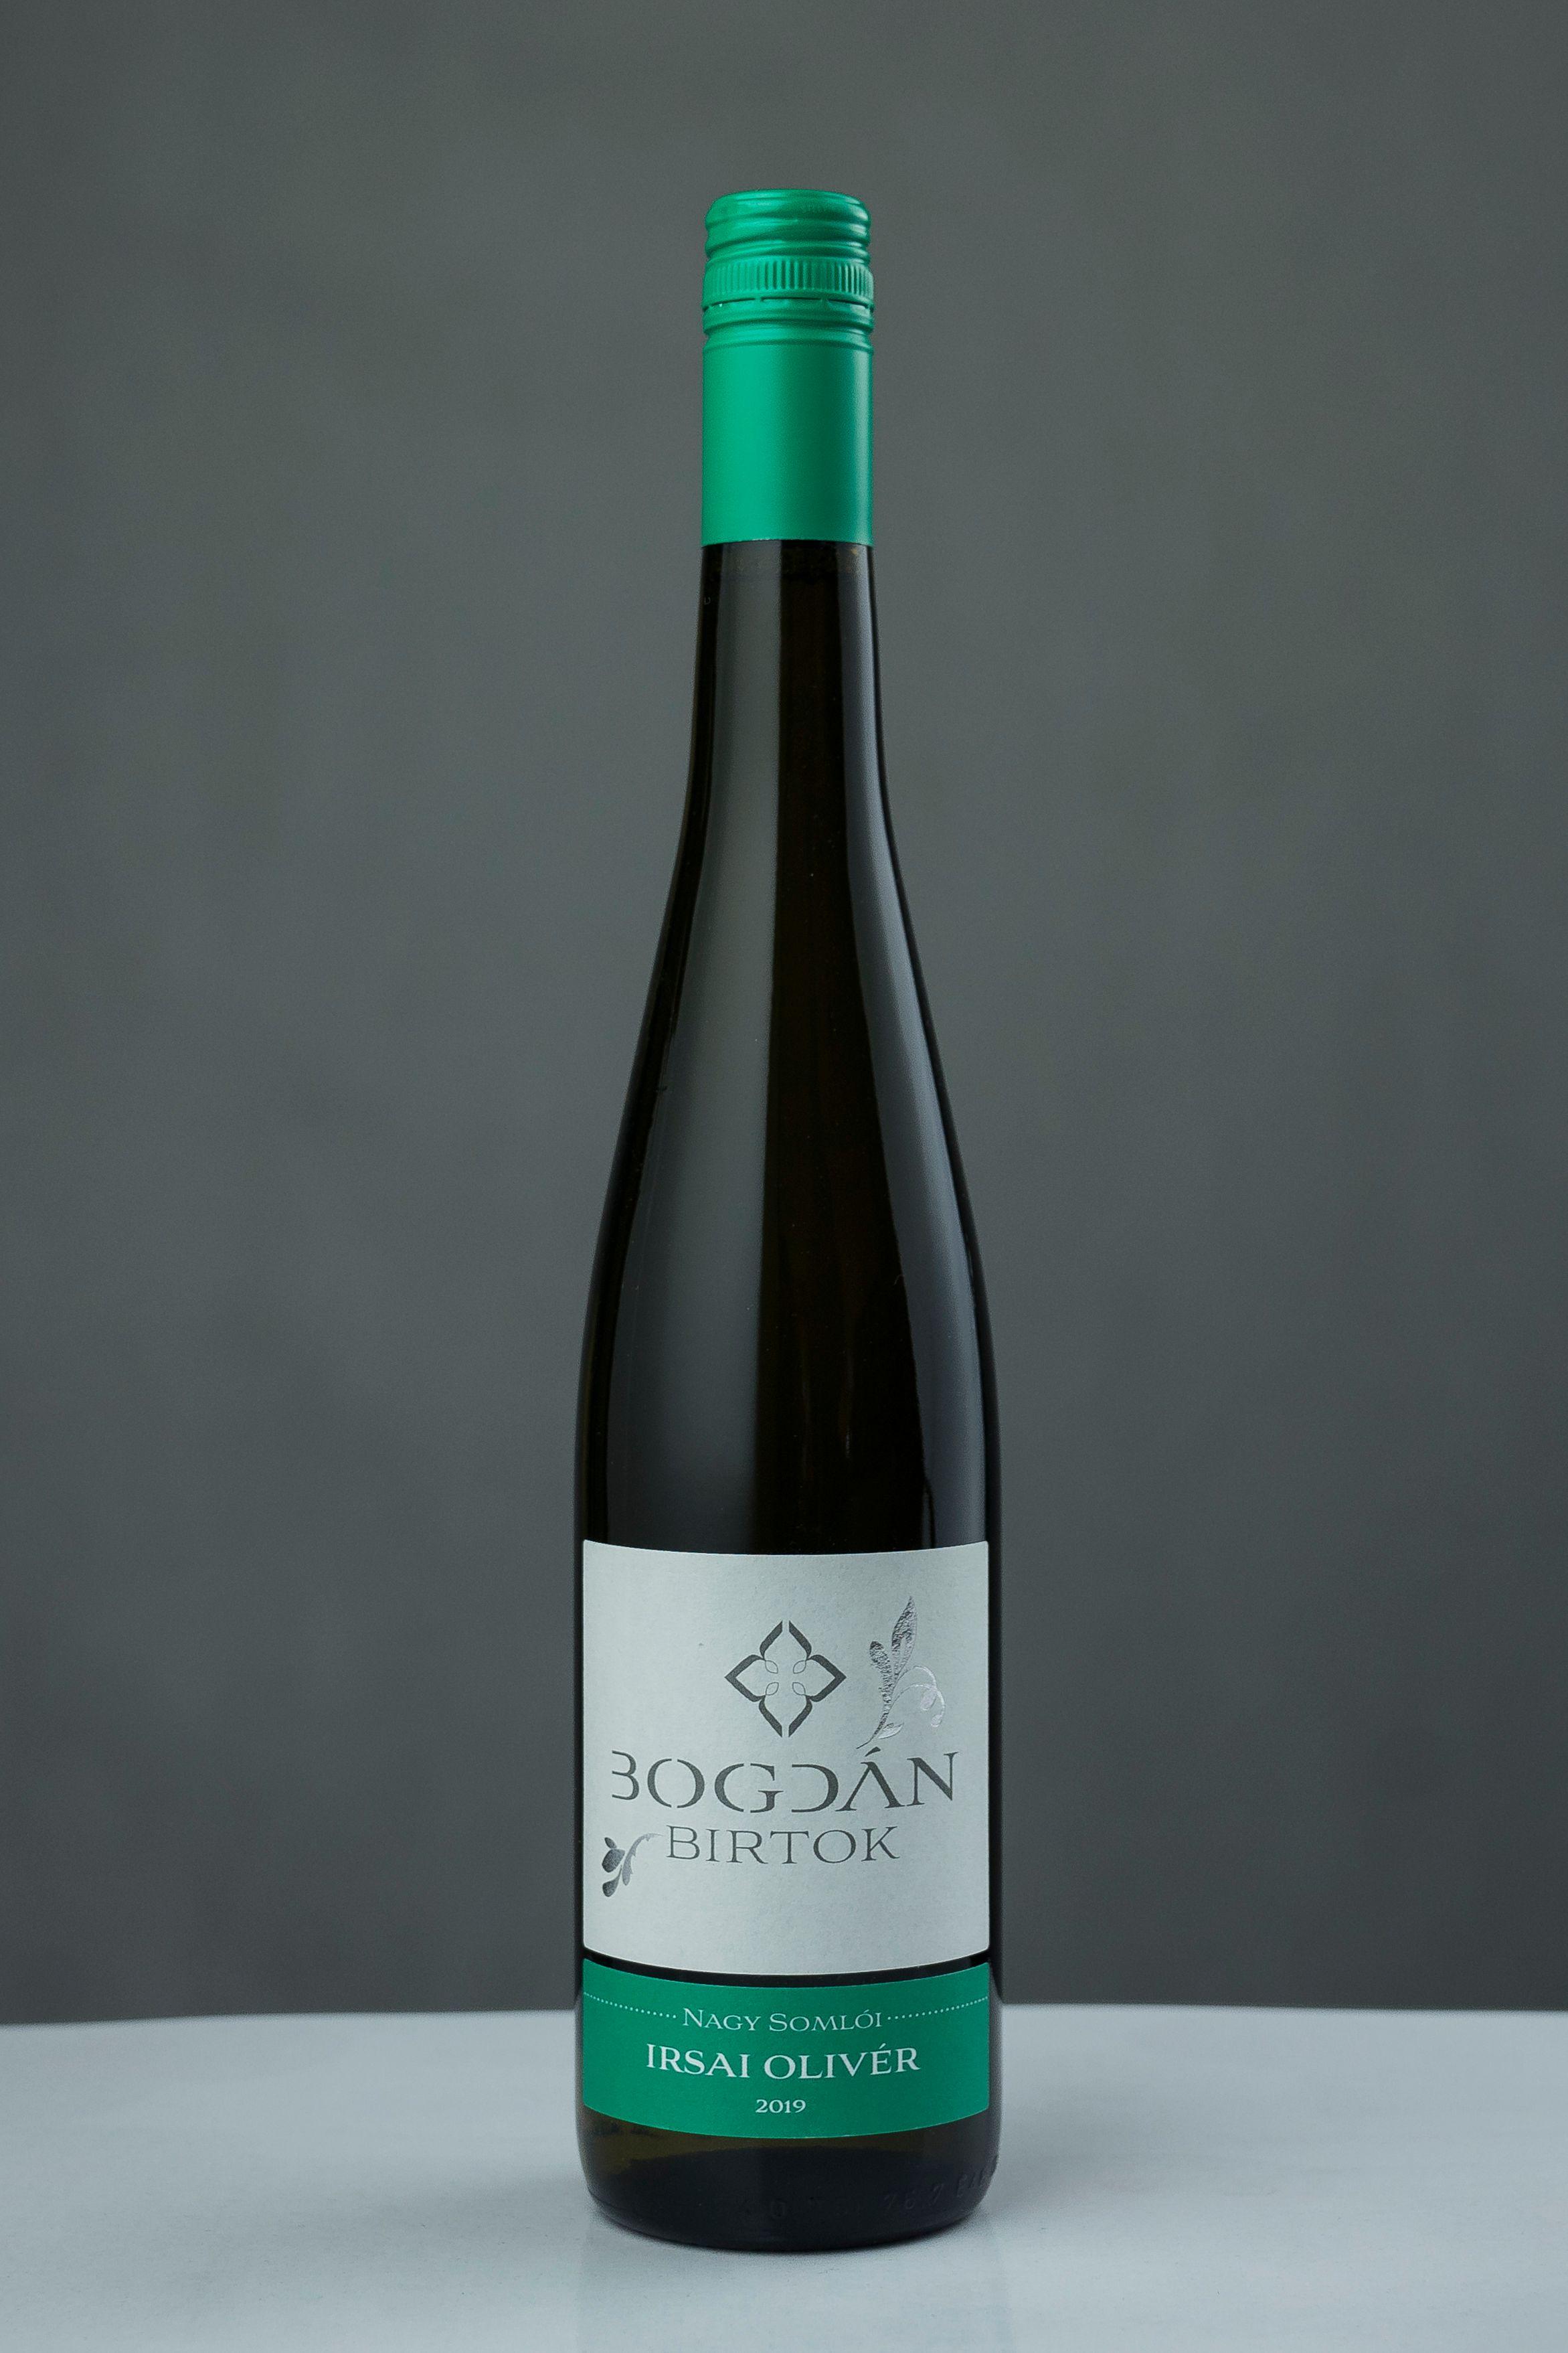 Bogdan-birtok-irsai-oliver